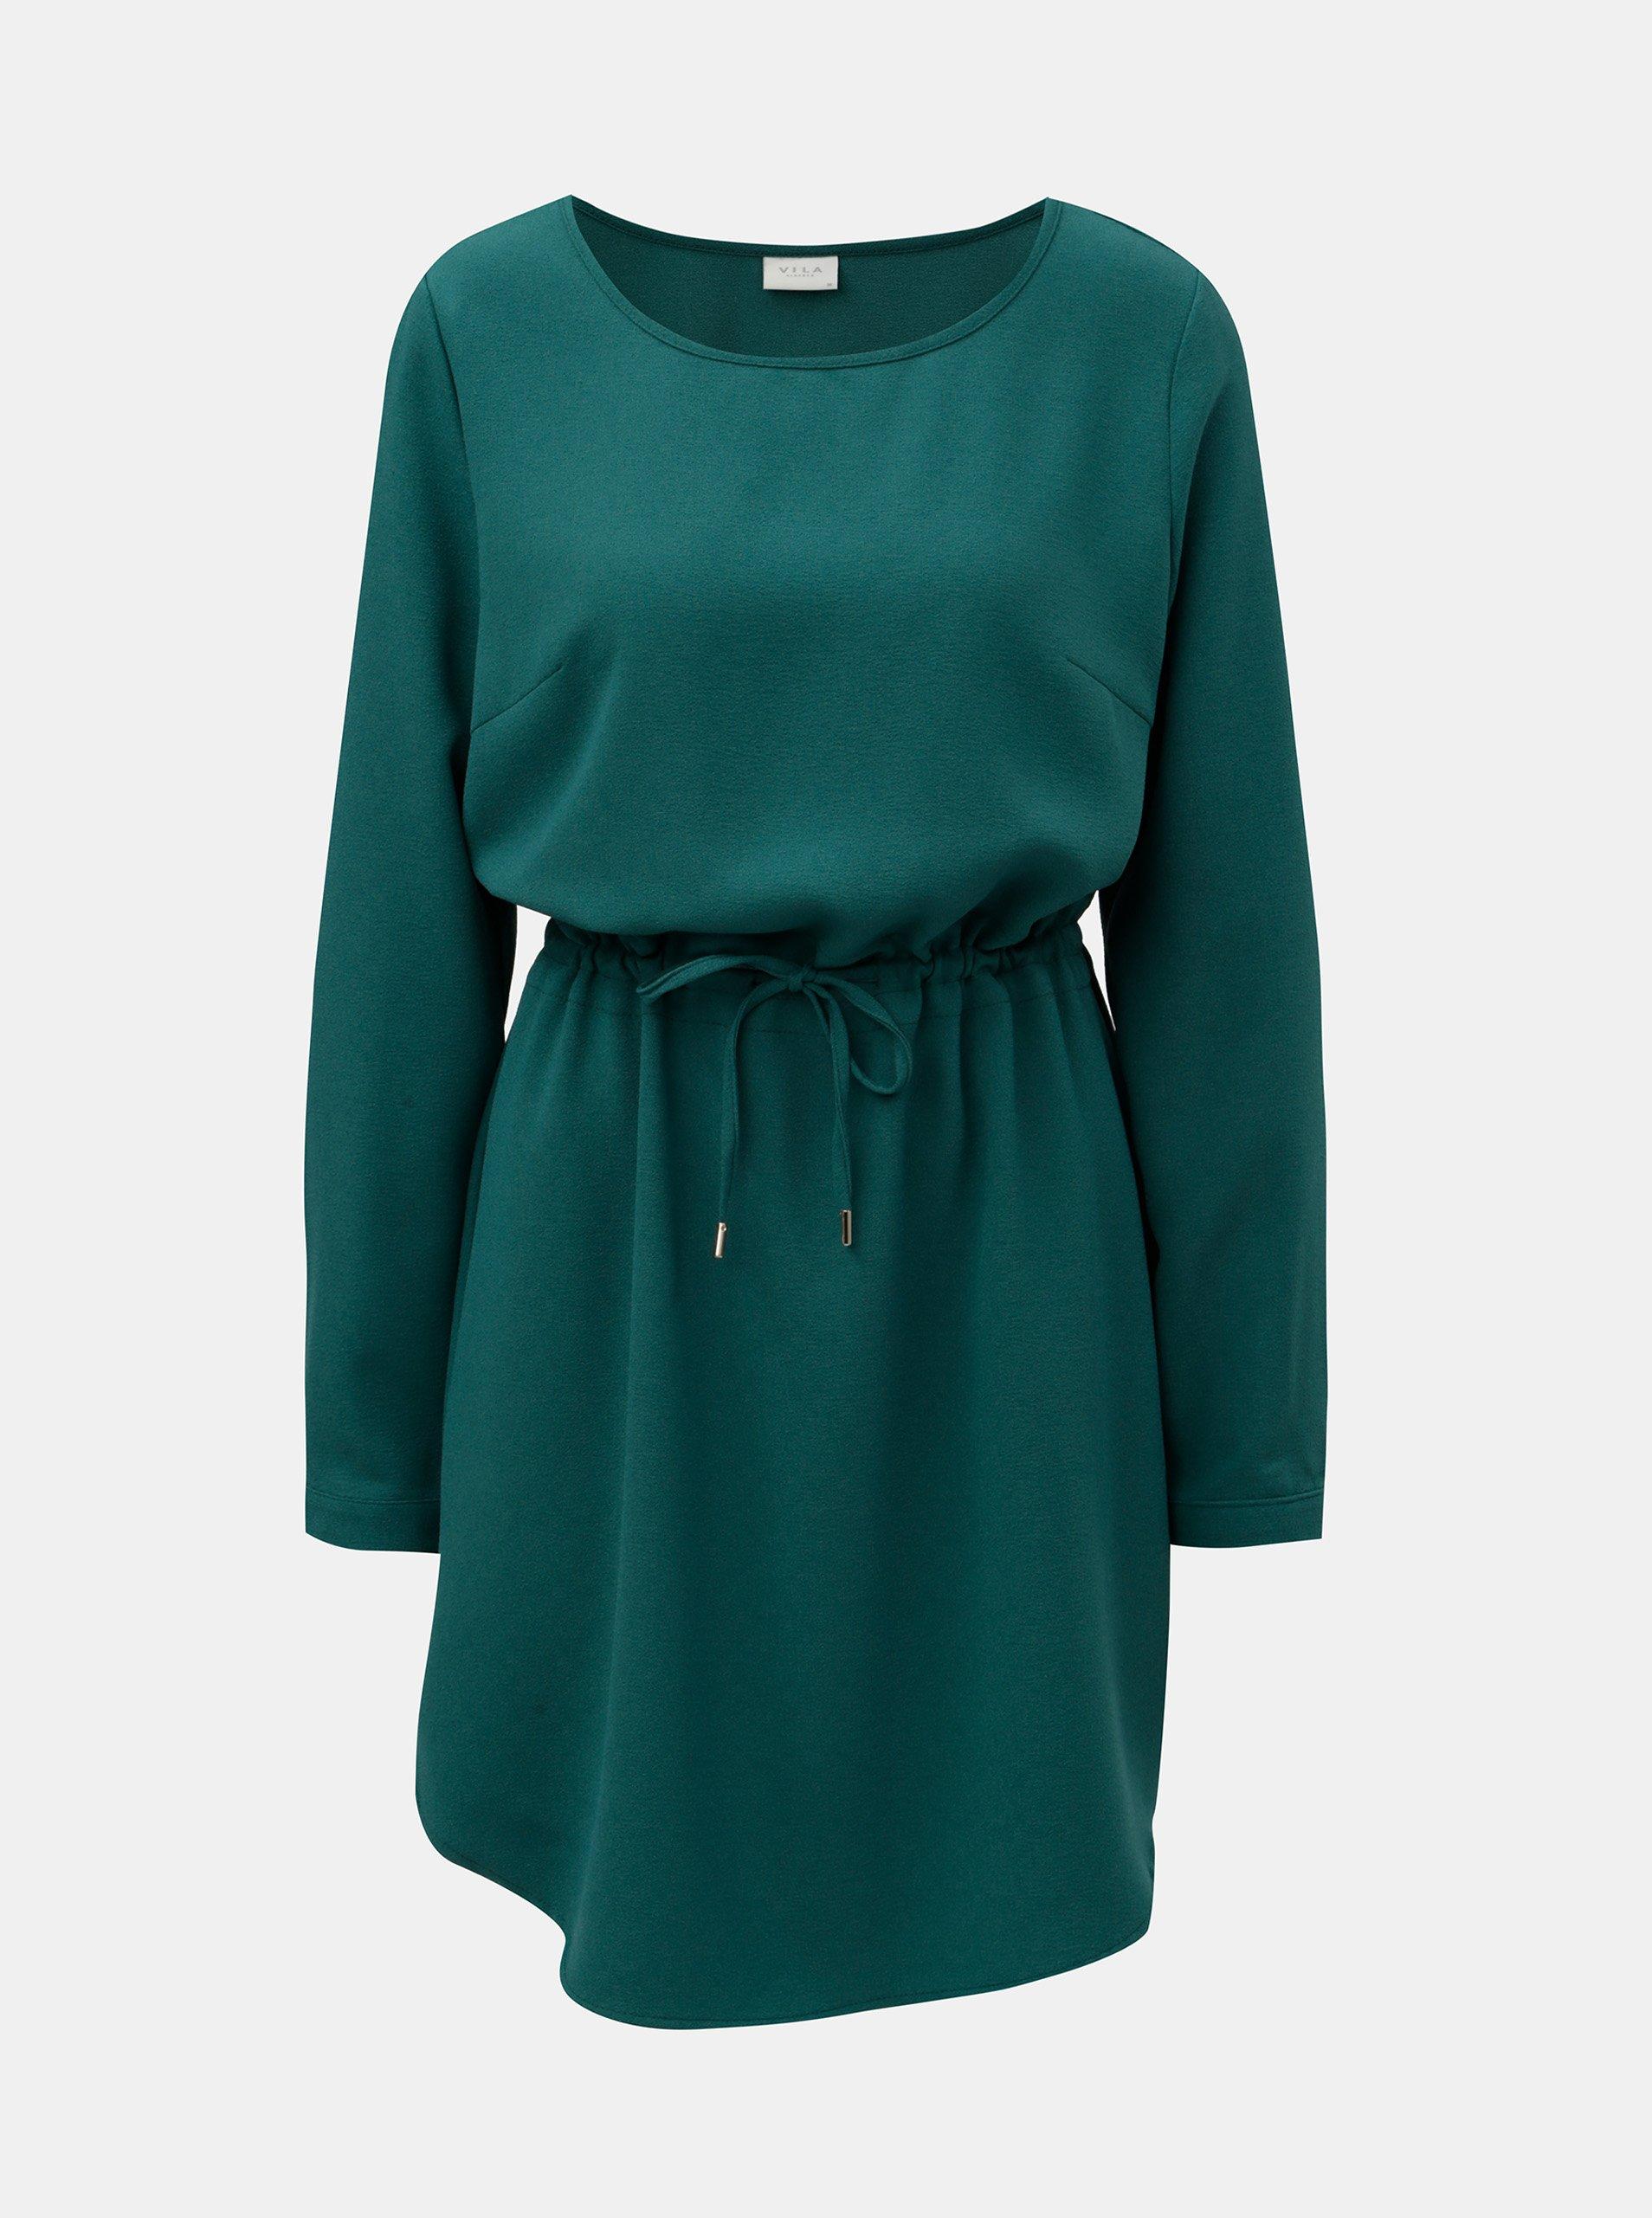 Zelené šaty s dlhým rukávom VILA Visealo